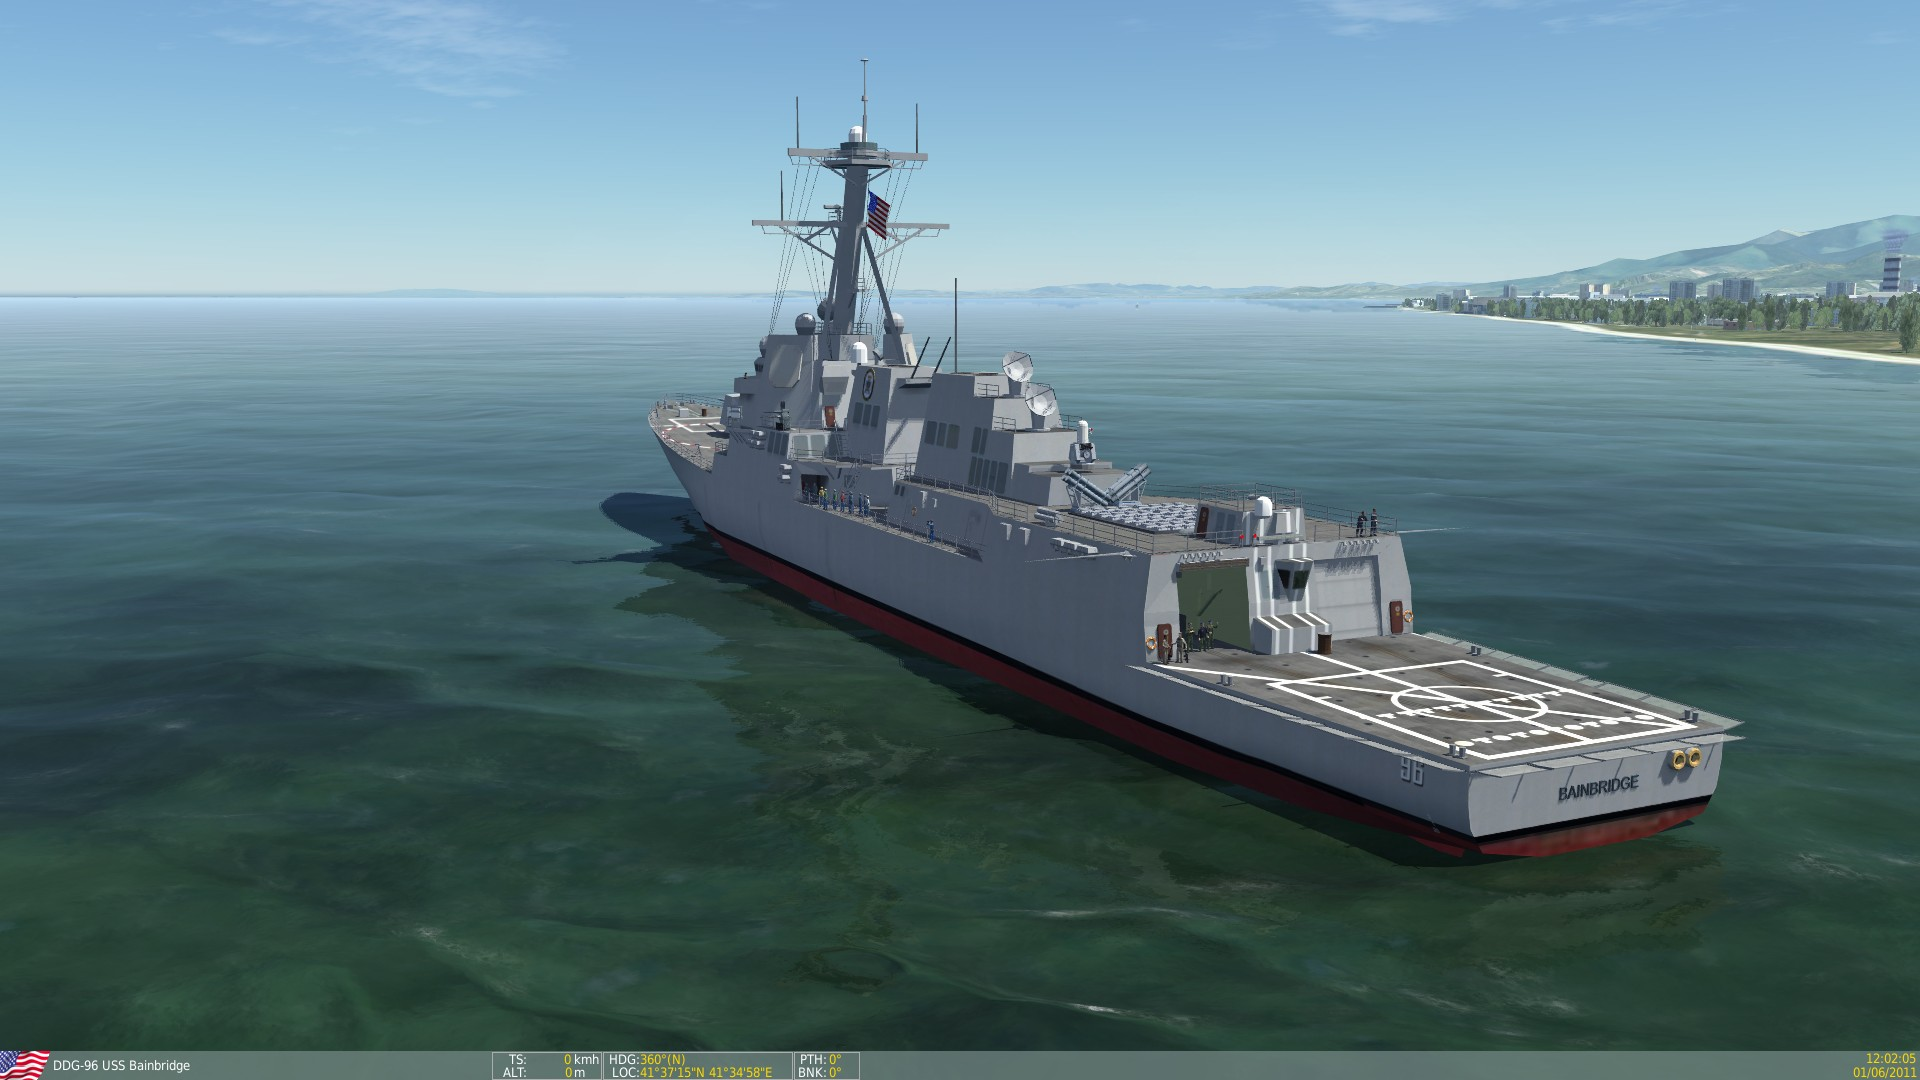 3 ship uss arleigh burke class